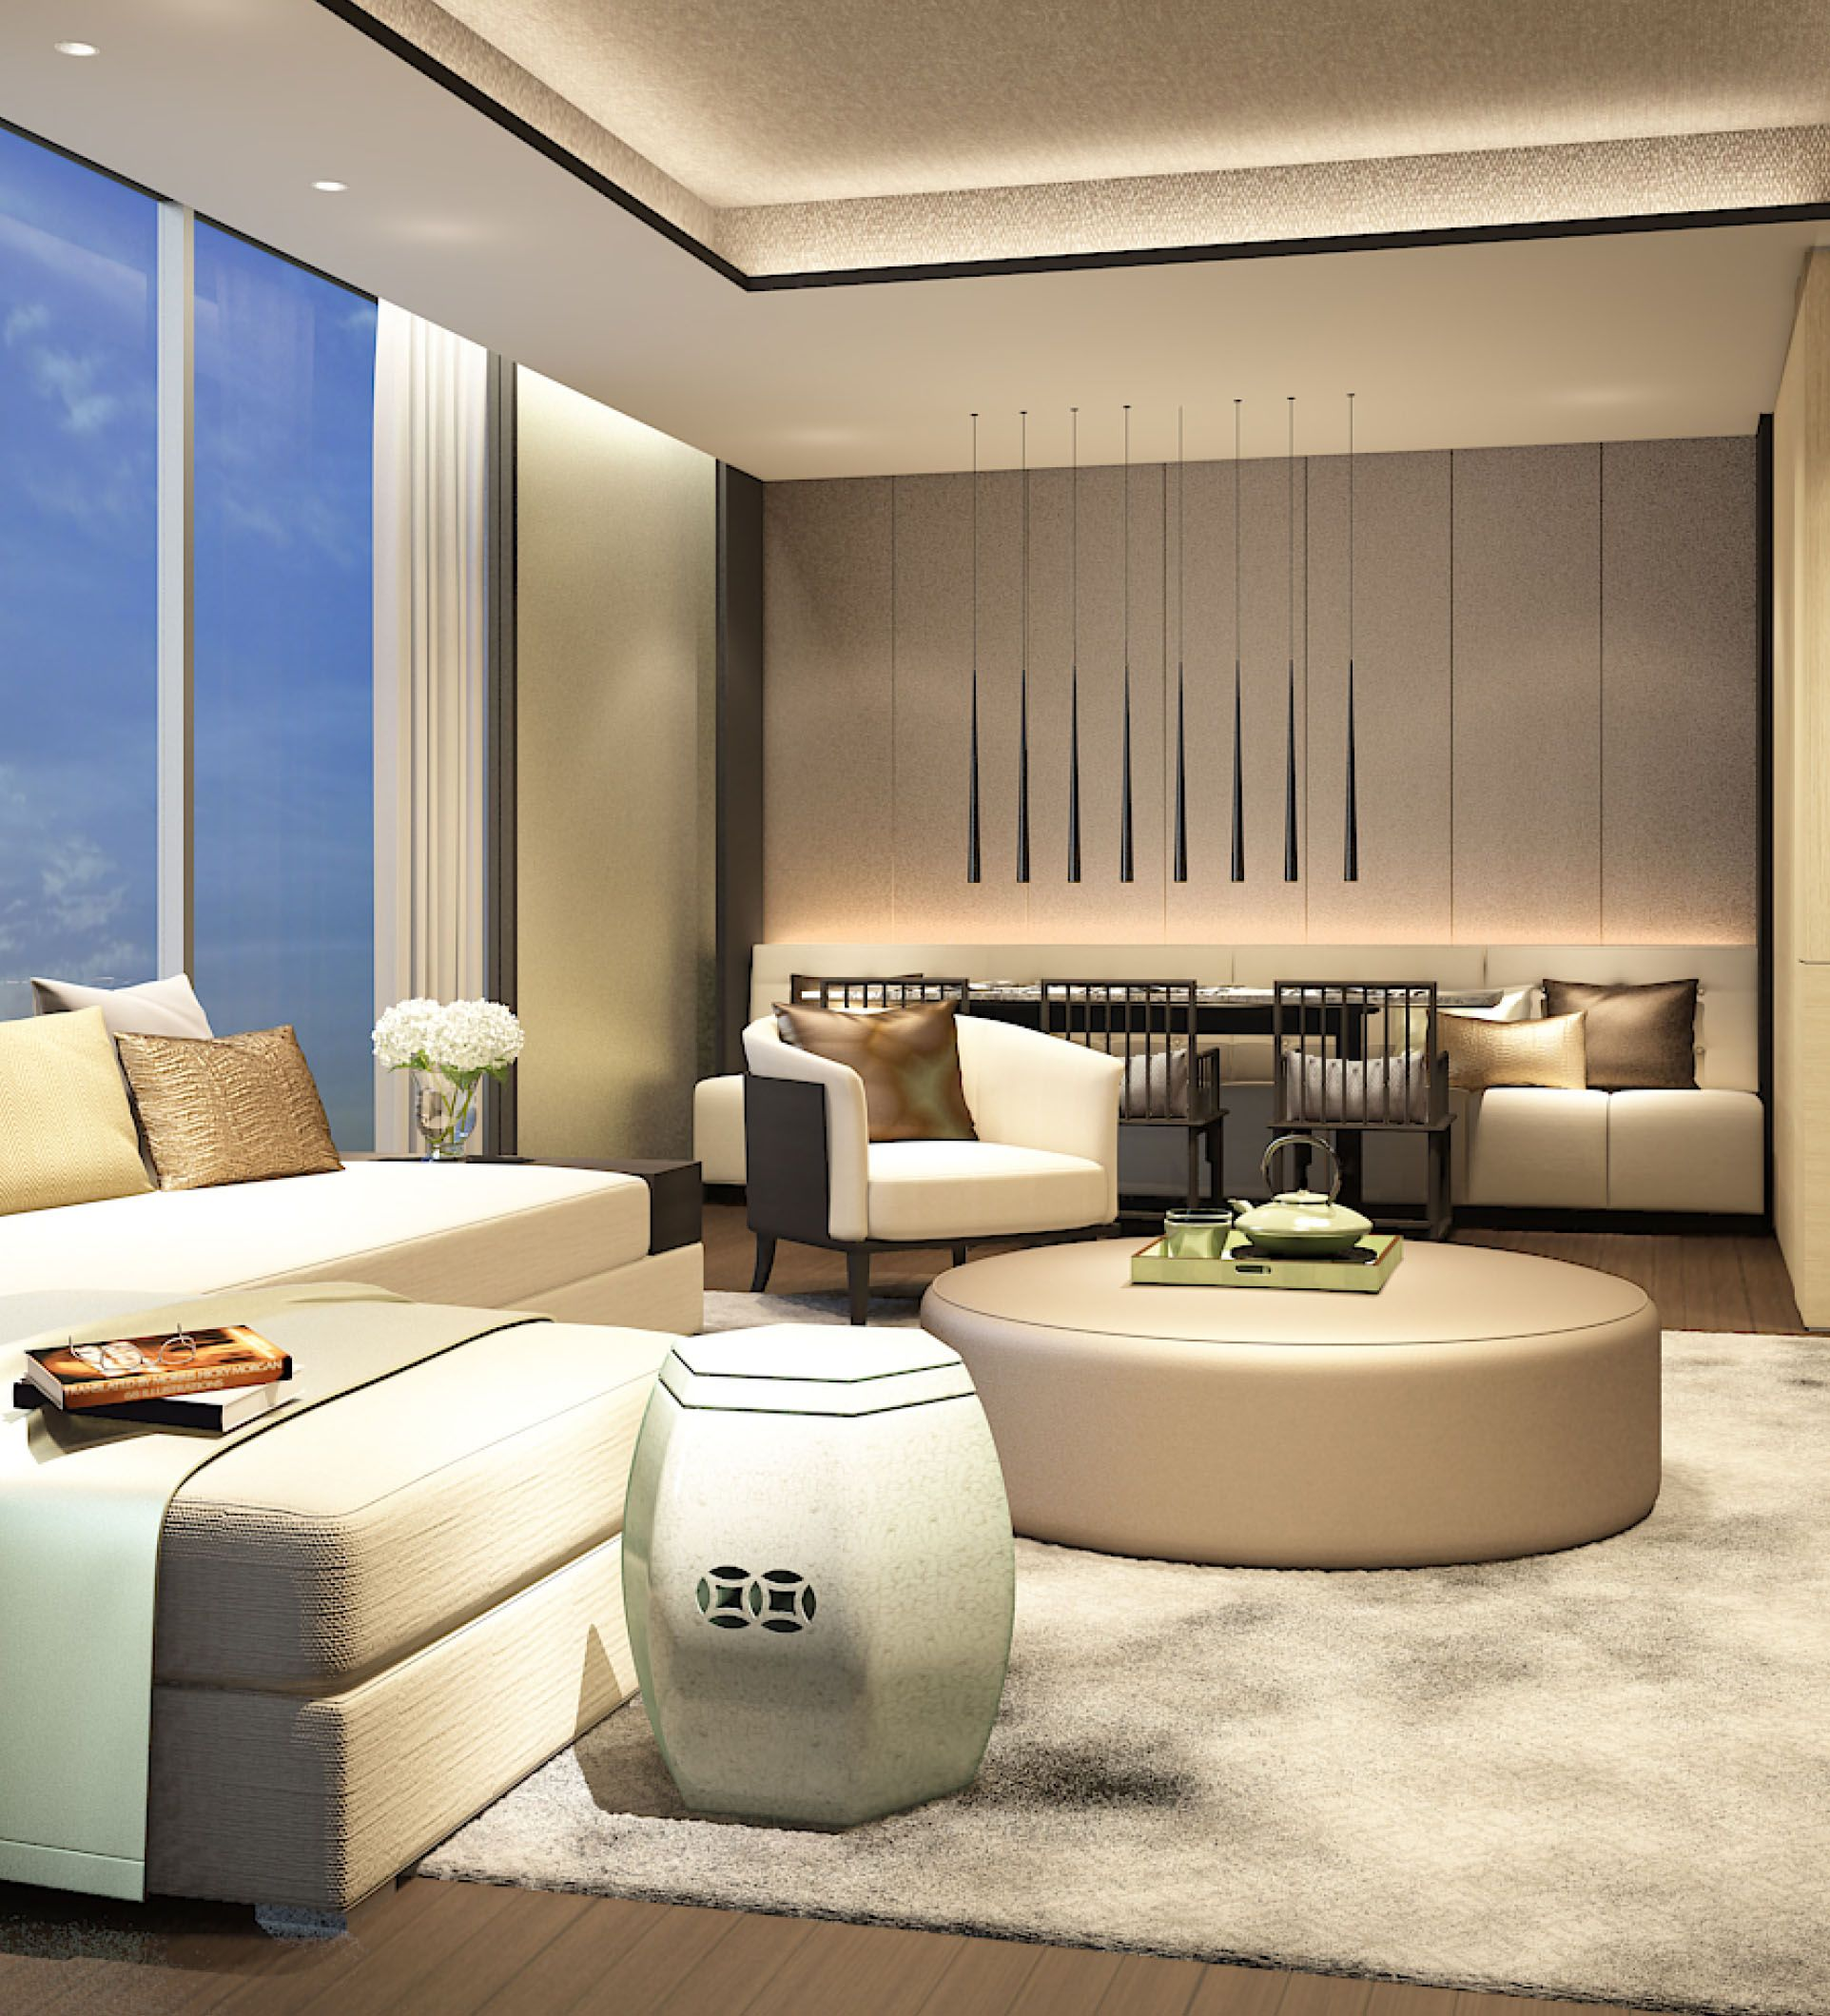 Interior Design Bright Living Rooms: SCDA Hotel & Mixed-Use Development, Nanjing, China